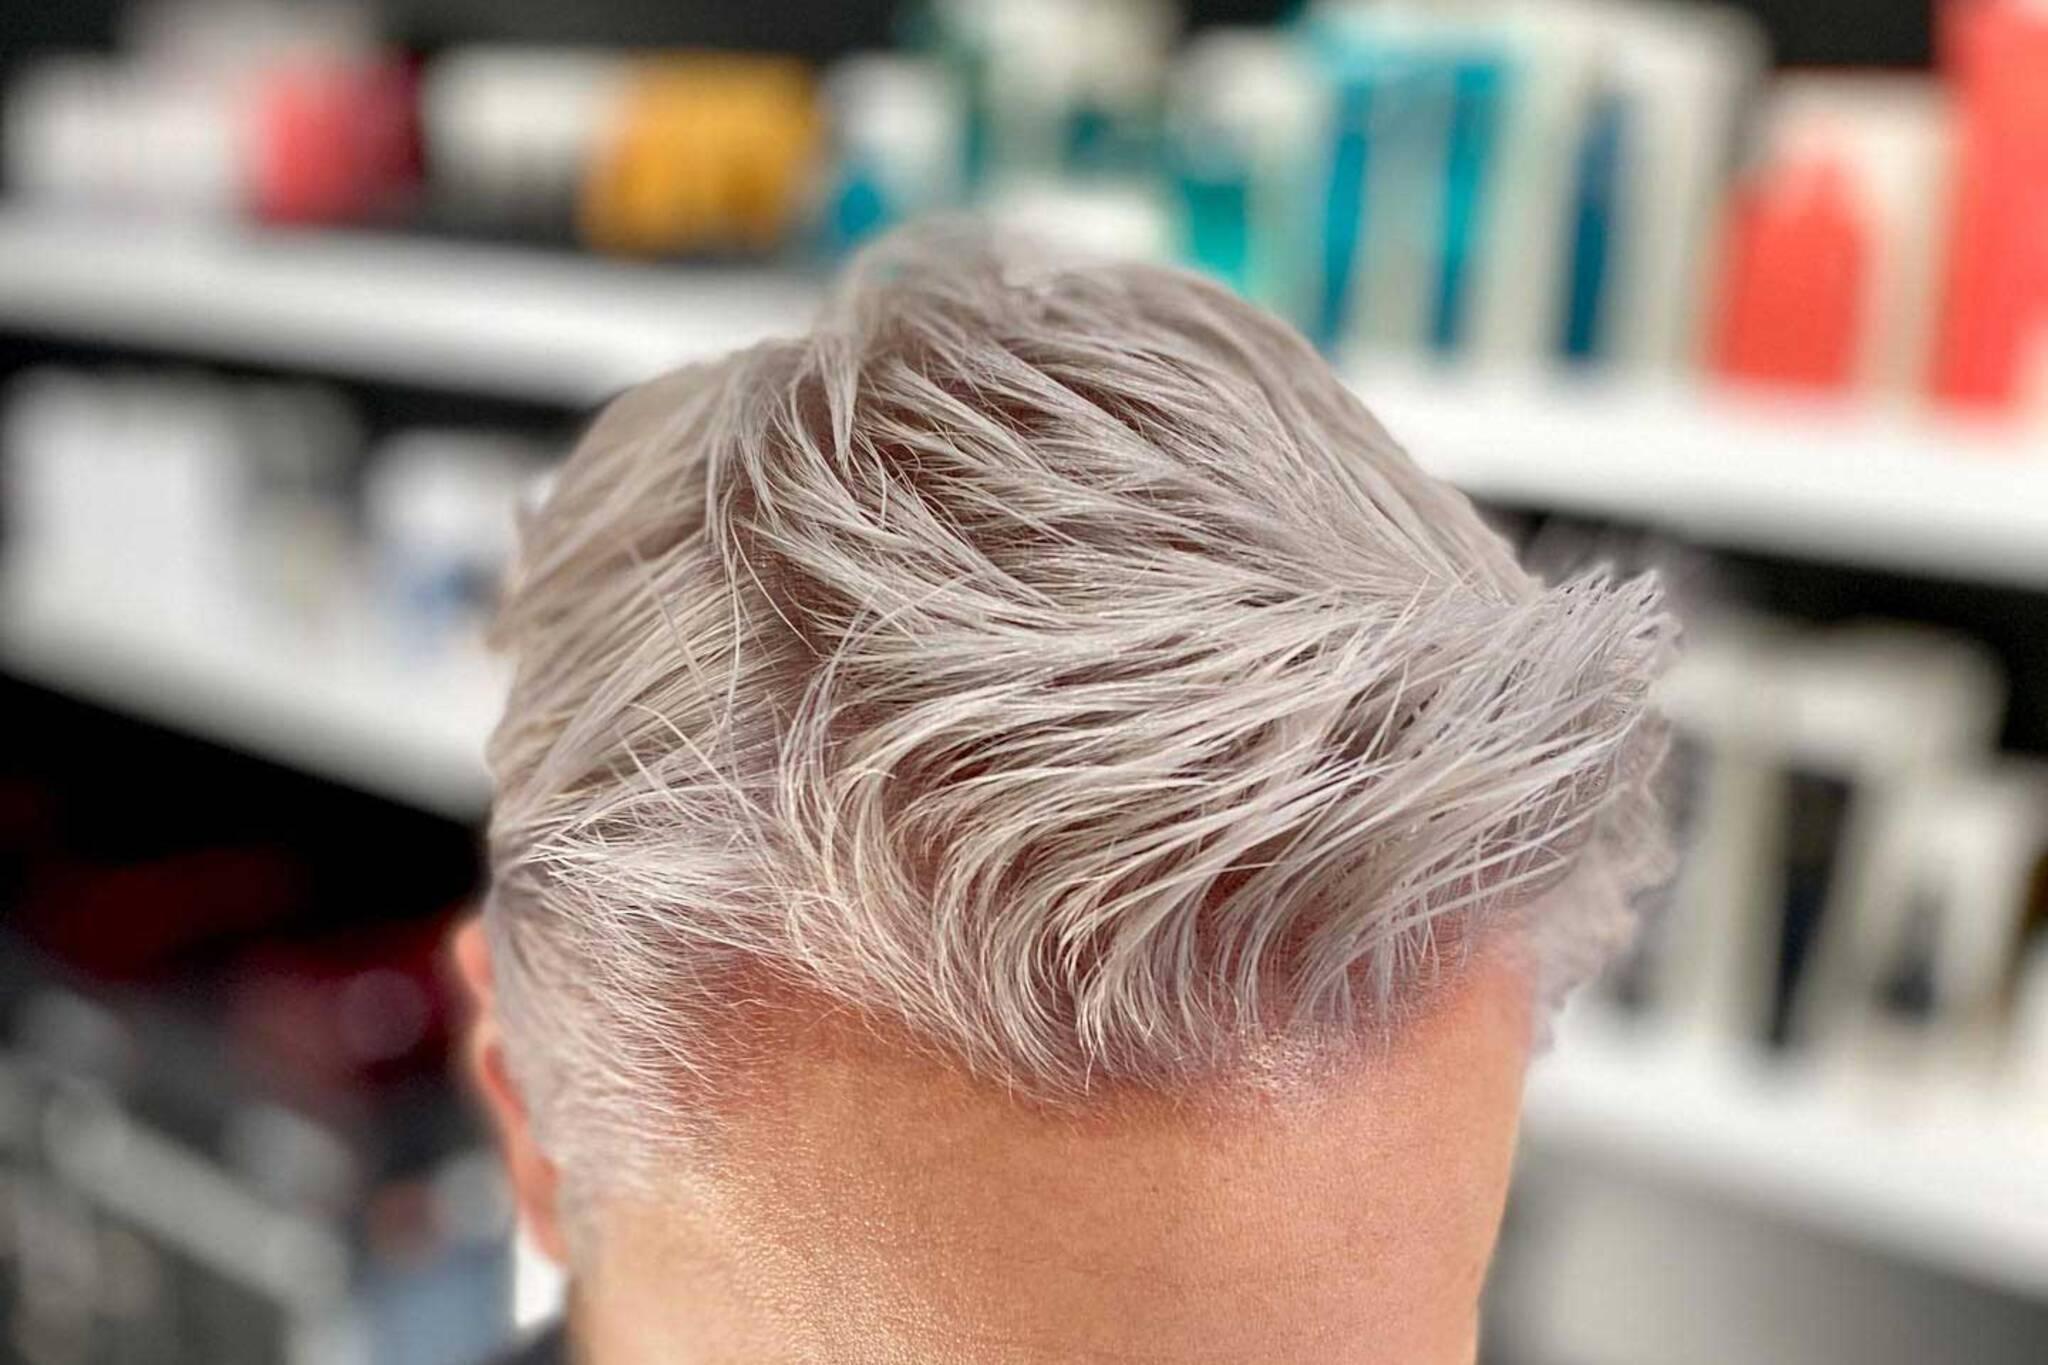 hair salons covid 19